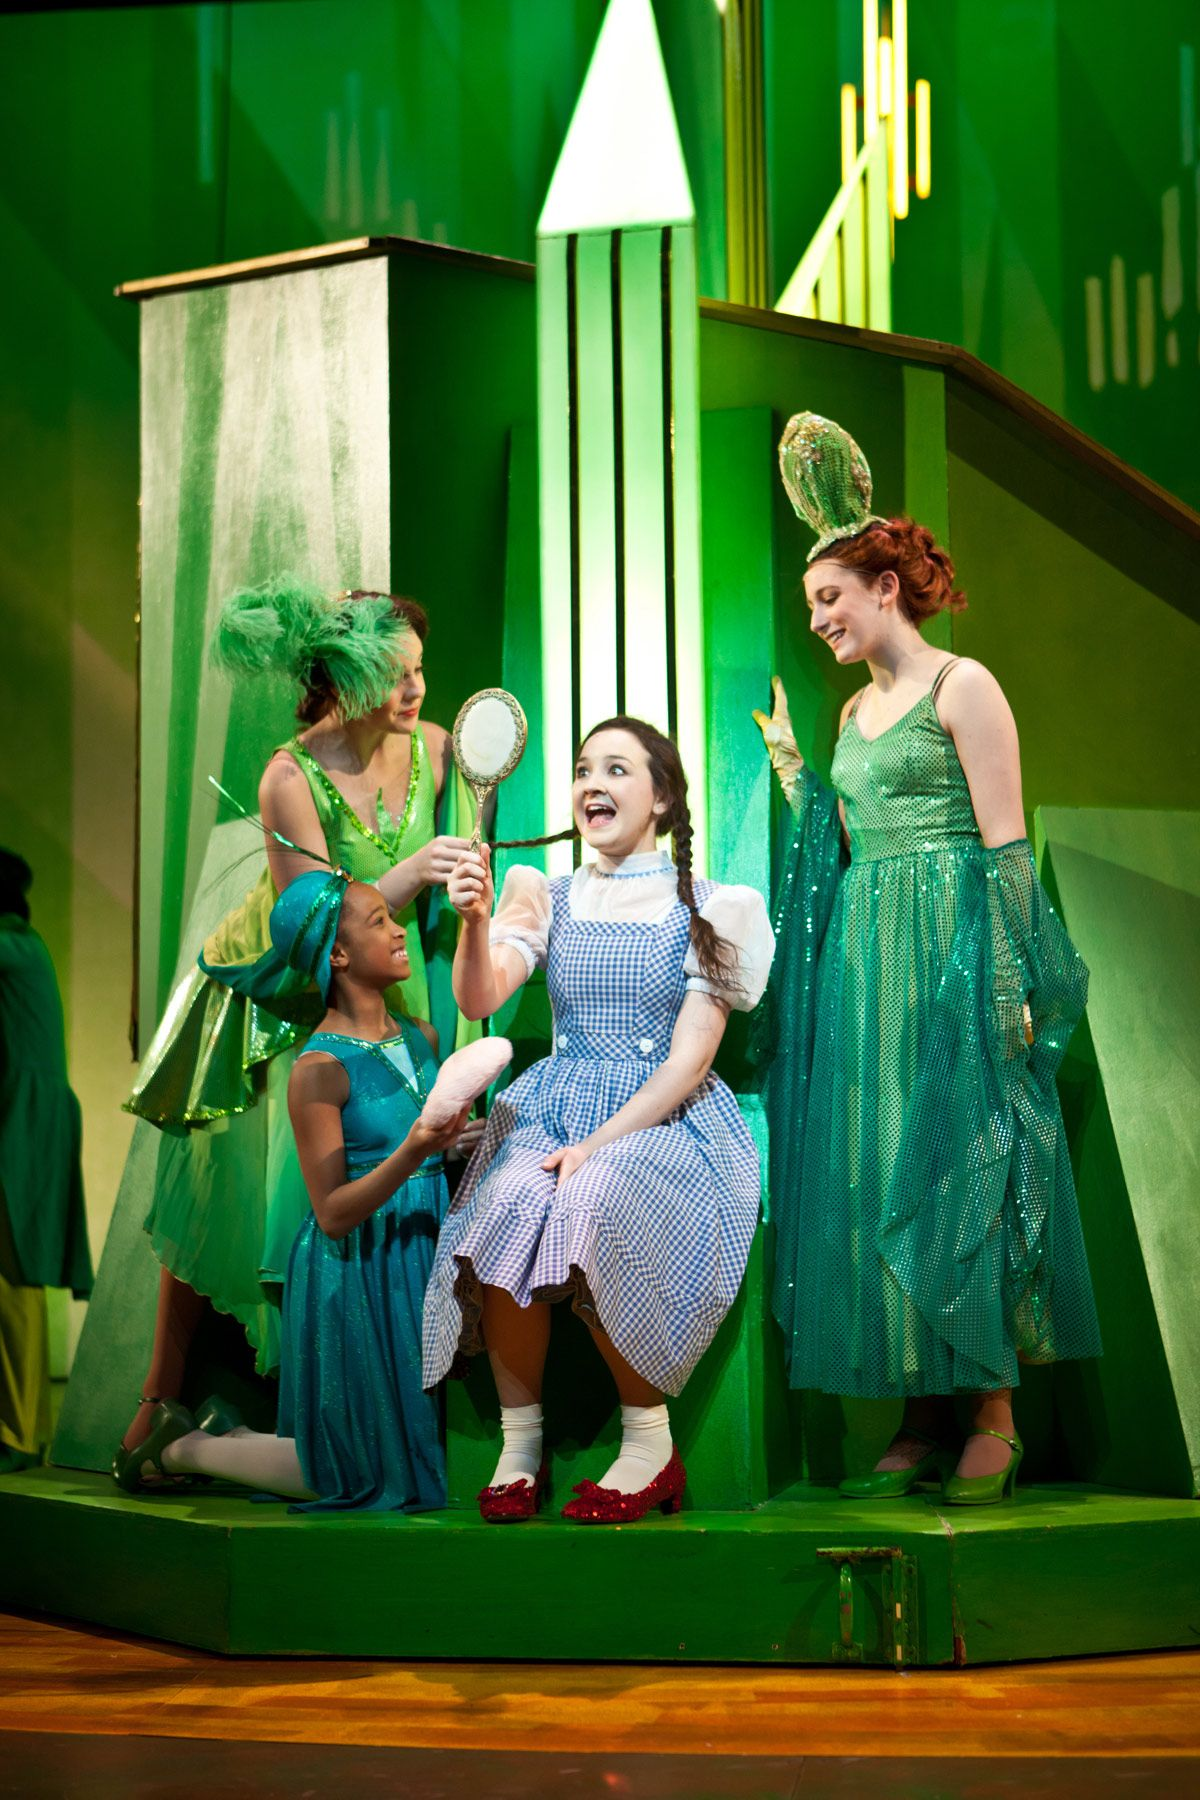 Wizard of Oz 'Emerald city' | Costuming | Pinterest | Emerald city ...